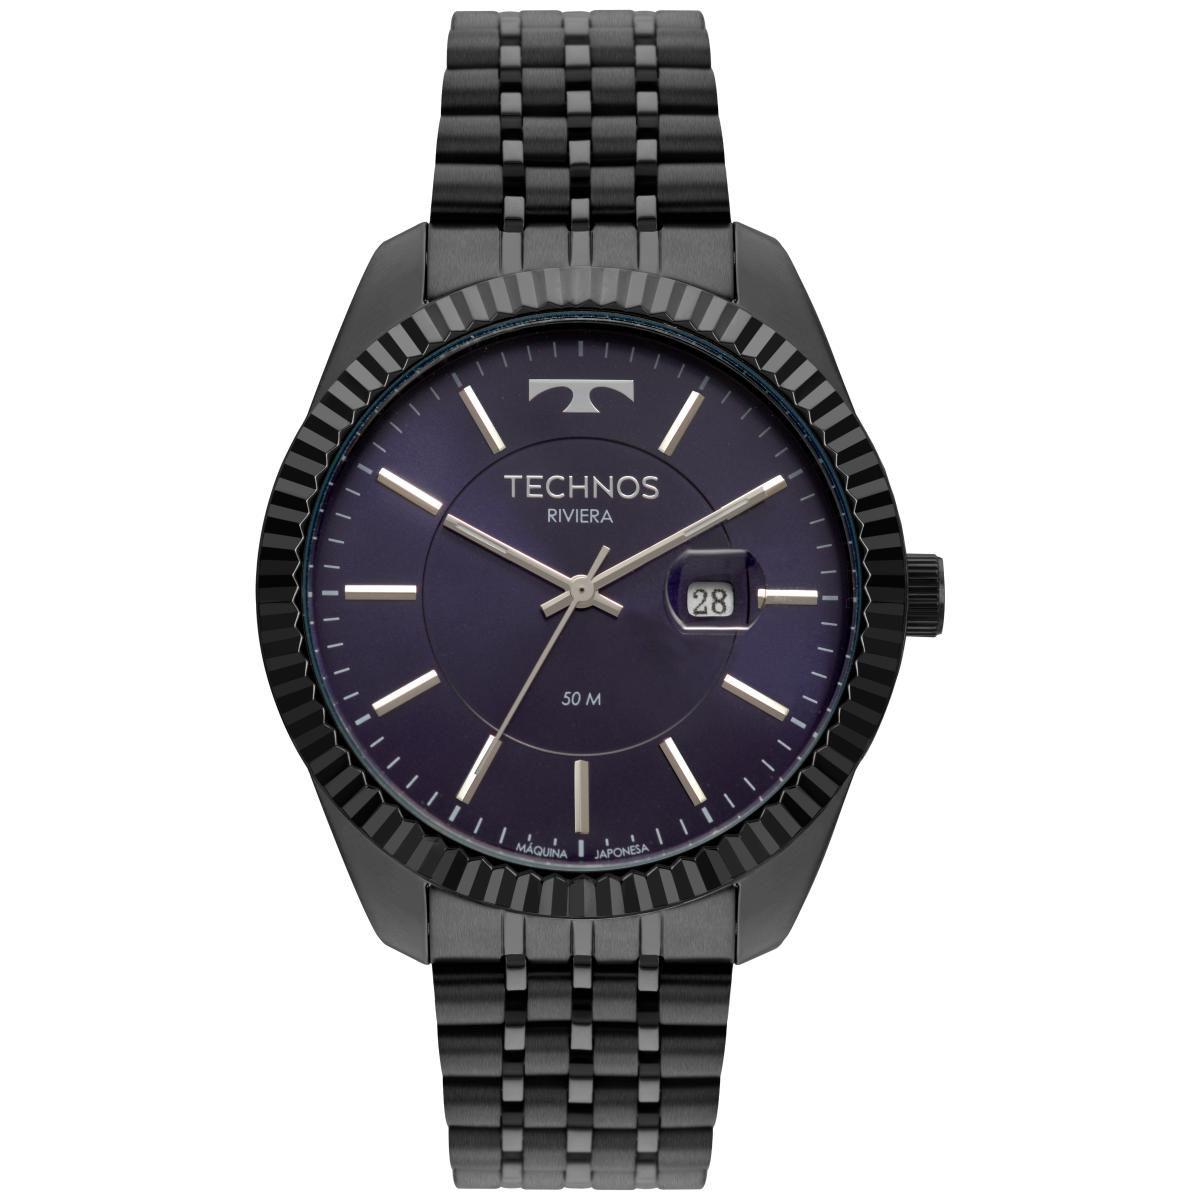 Relógio Masculino Technos Riviera 2115MSV/4A 46mm Aço Grafite